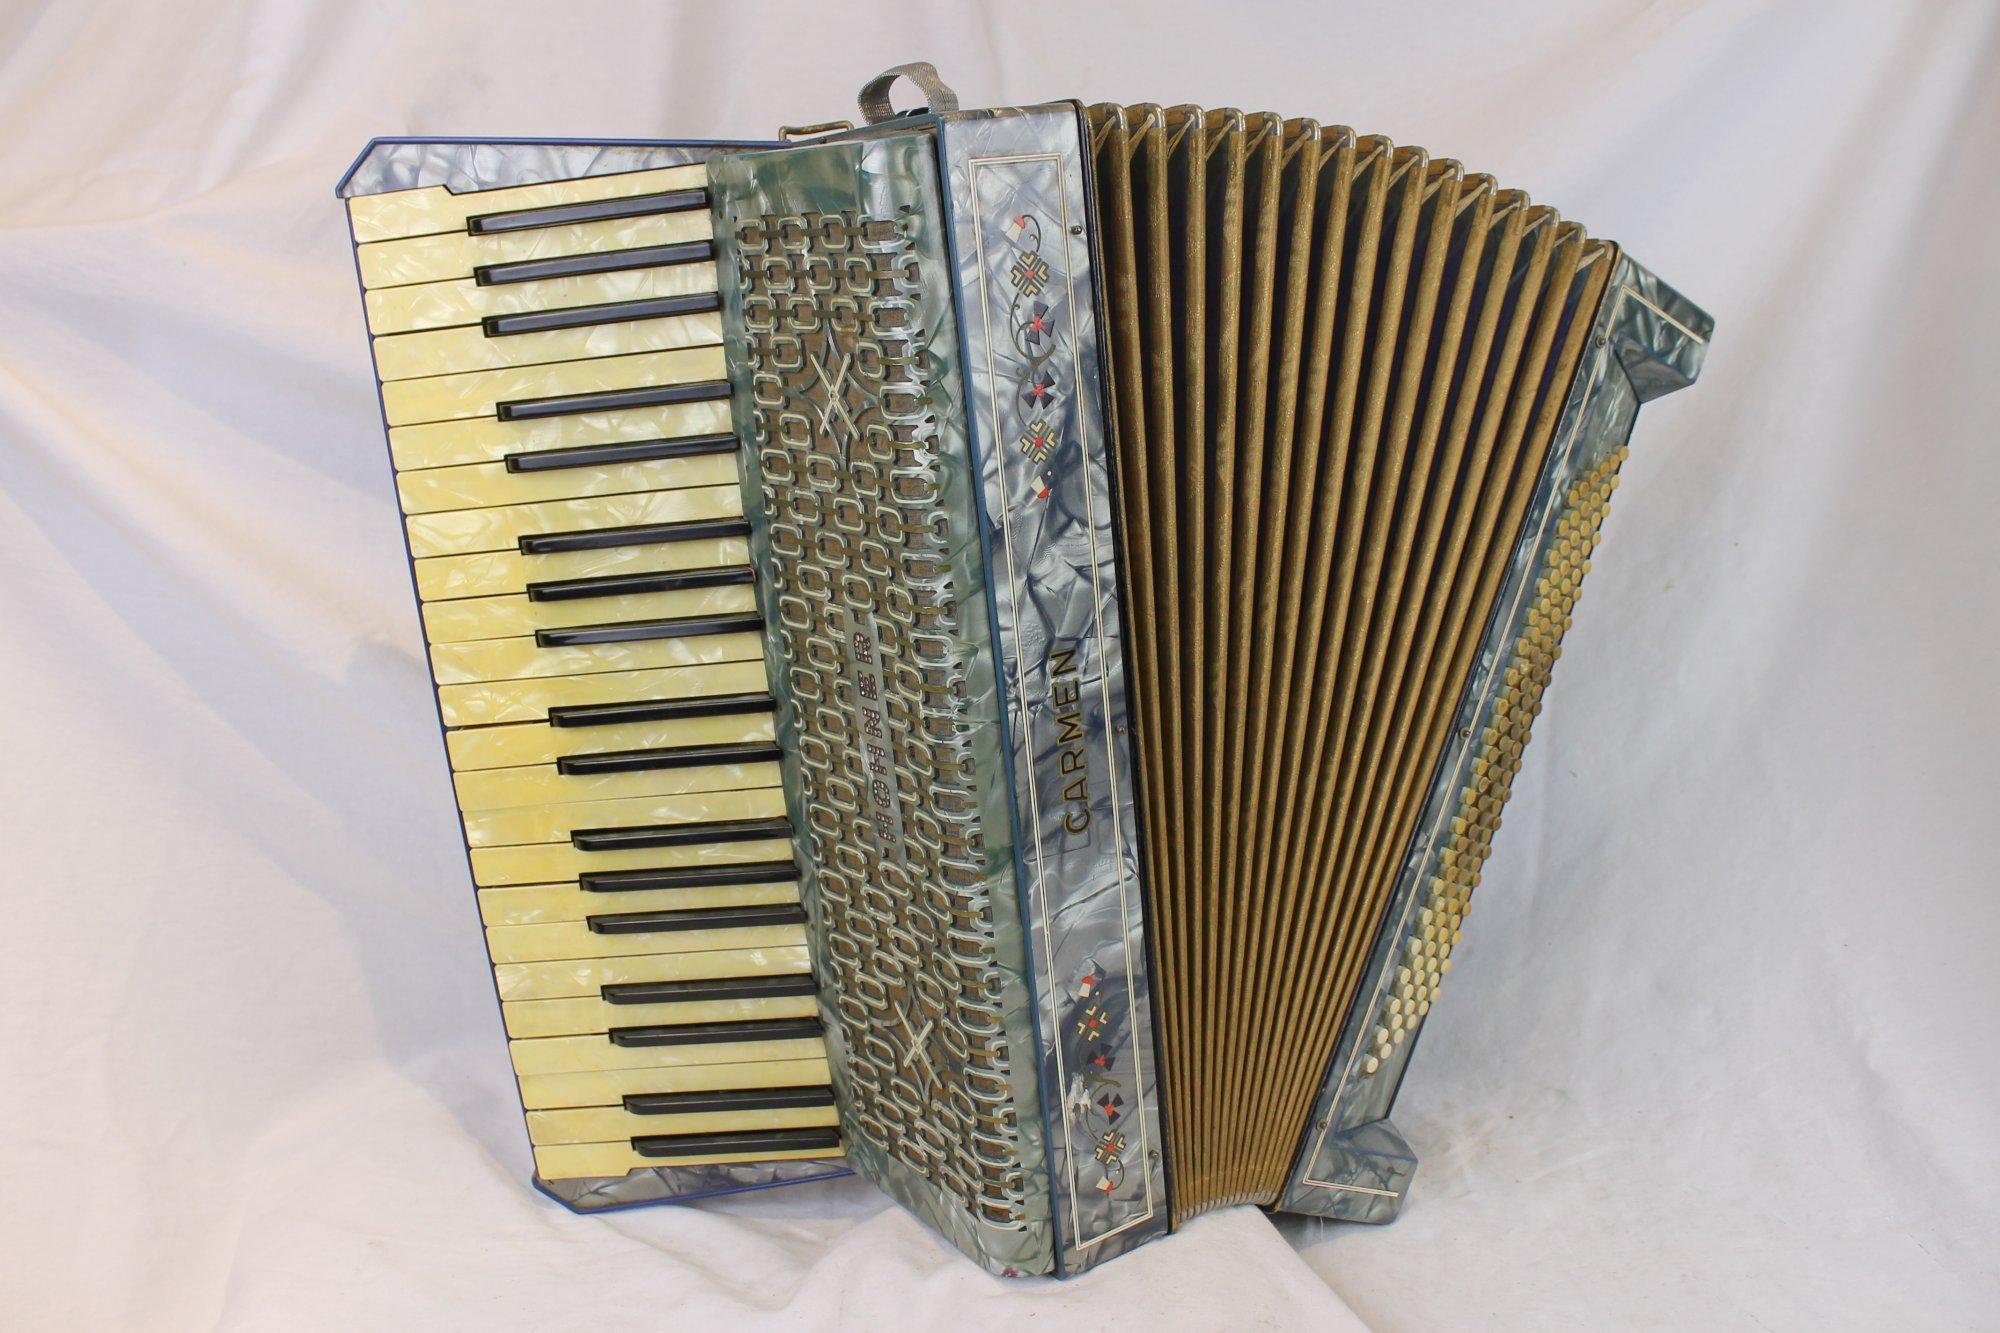 6123 - Decorated Blue Hohner Carmen Piano Accordion LMM 41 120